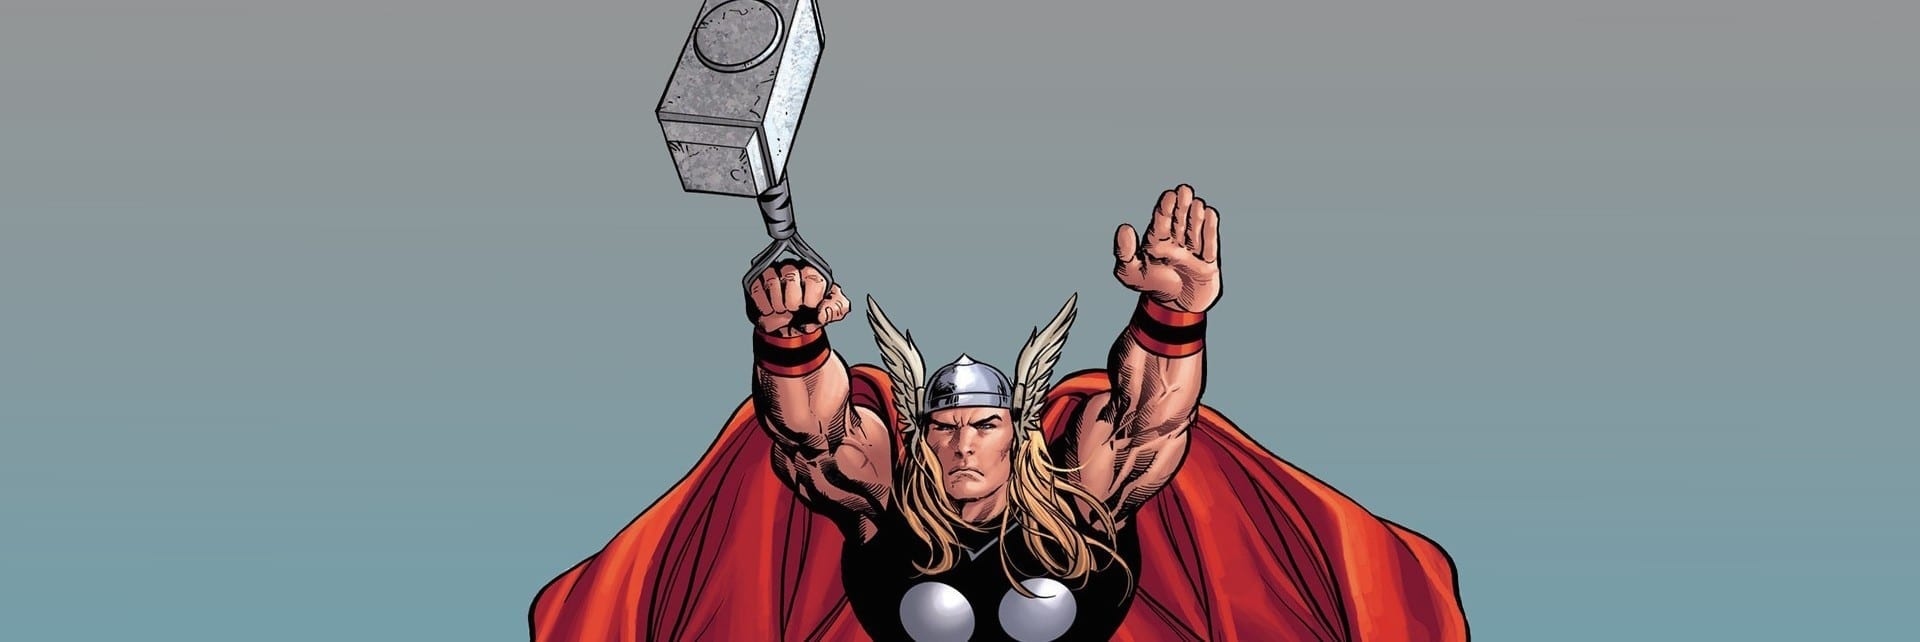 Battle Thor VS Aquaman My Geek Actu Thor.jpg